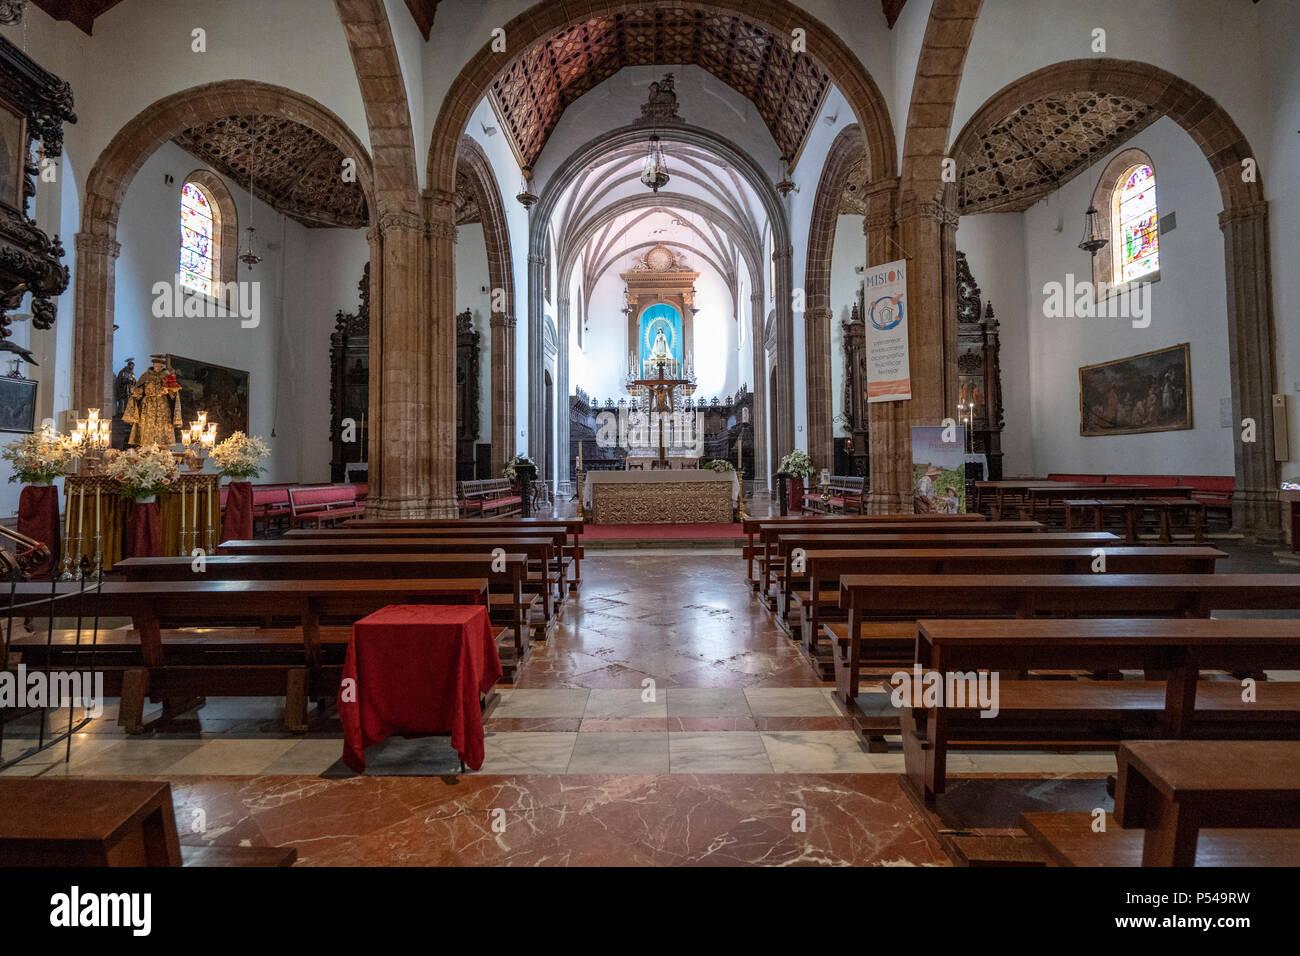 La laguna, Tenerife, Canary Islands, June 7, 2018: Interior of Nuestra Senora de la Concepcion of the historical town of San Cristobal de La Laguna, - Stock Image